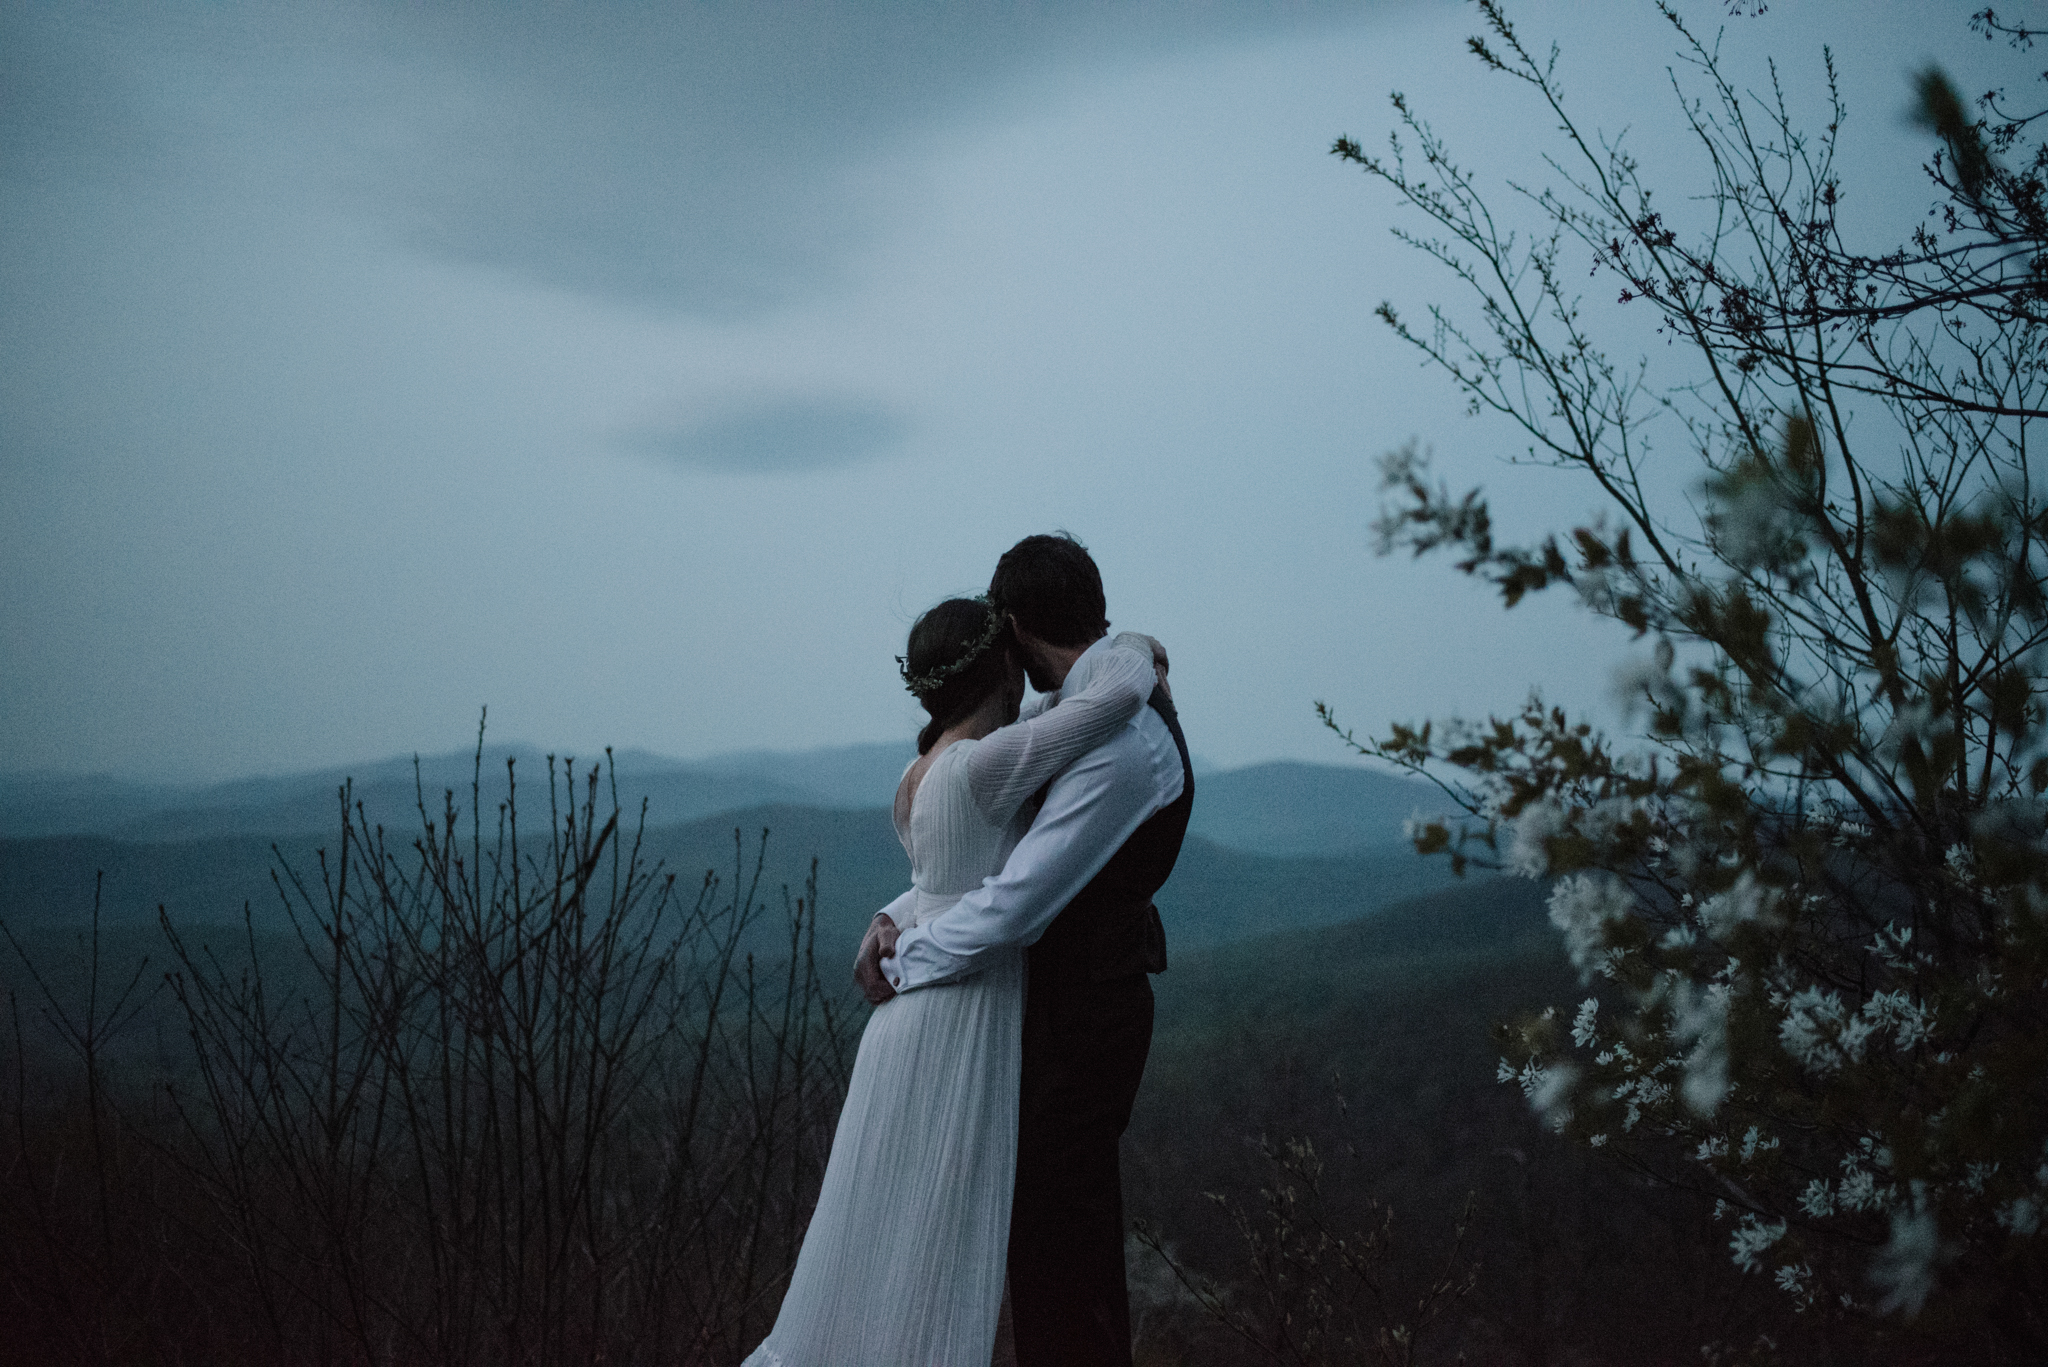 Lisa and Stuart - Post Wedding Couple Portraits - White Sails Creative - Blue Ridge Mountains - Sunrise Shenandoah National Park_18.JPG